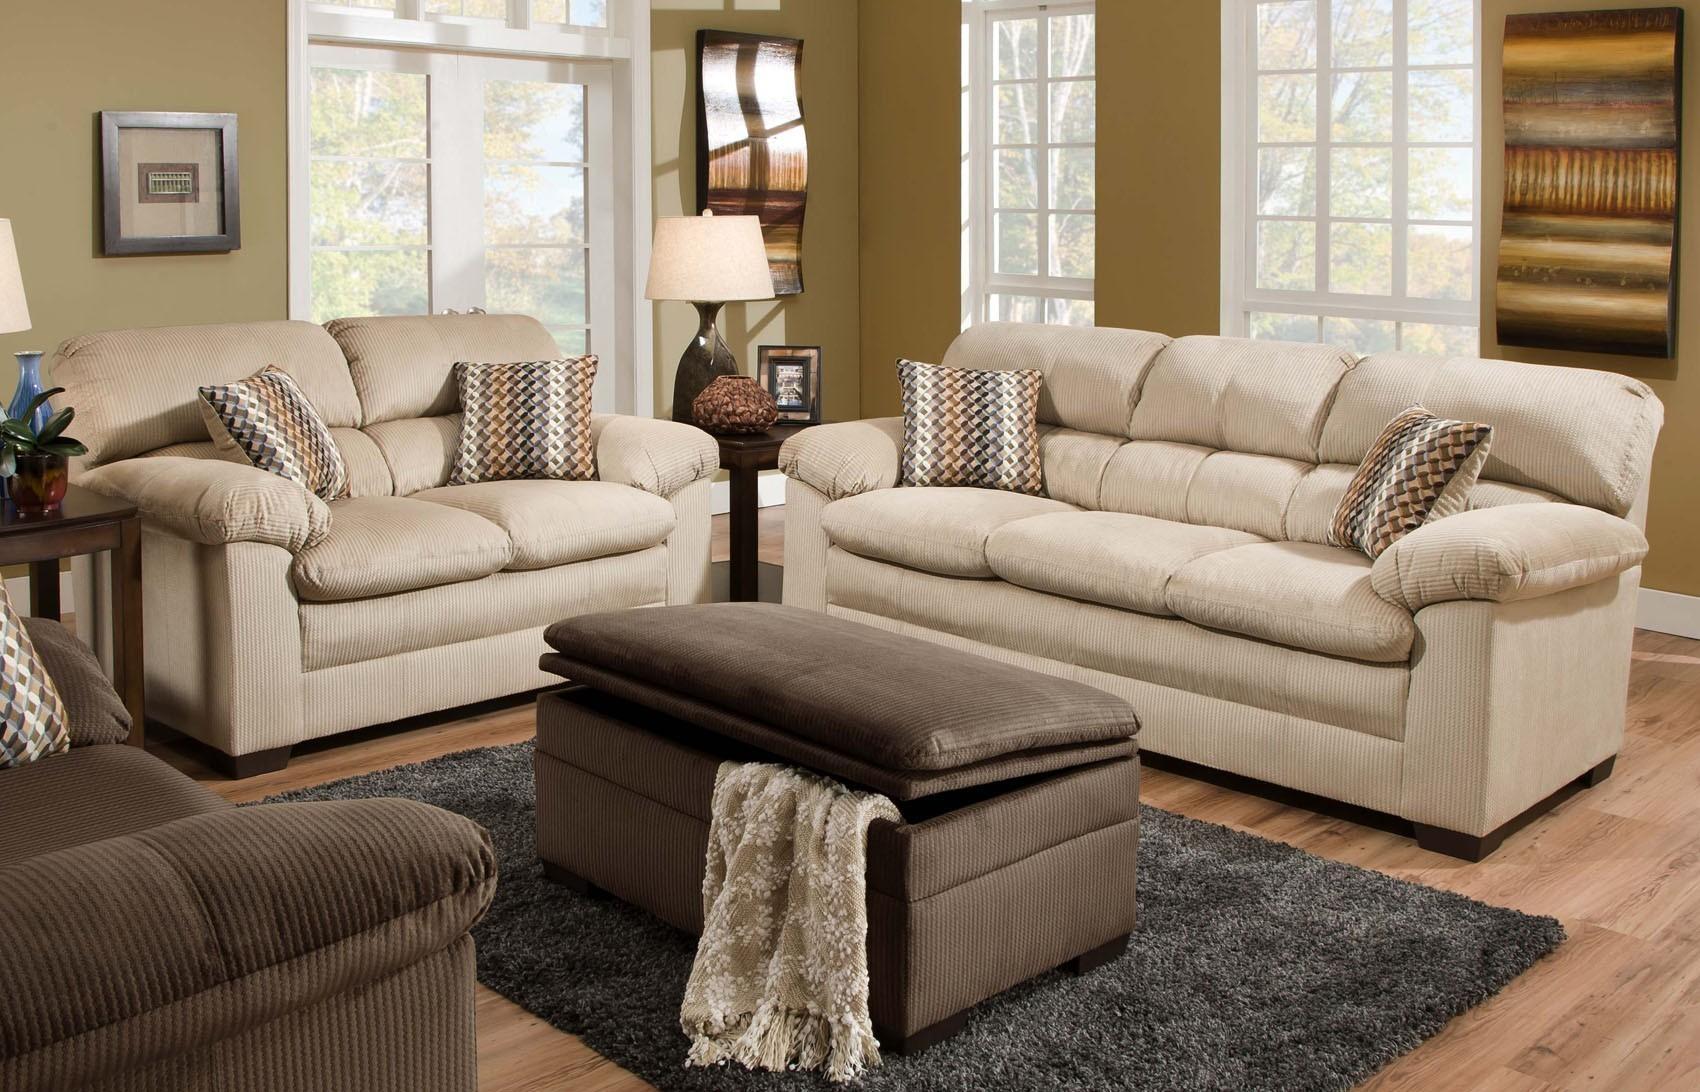 sectional sofas orange county ca nottingham vs bristol city sofascore 20 best sofa ideas